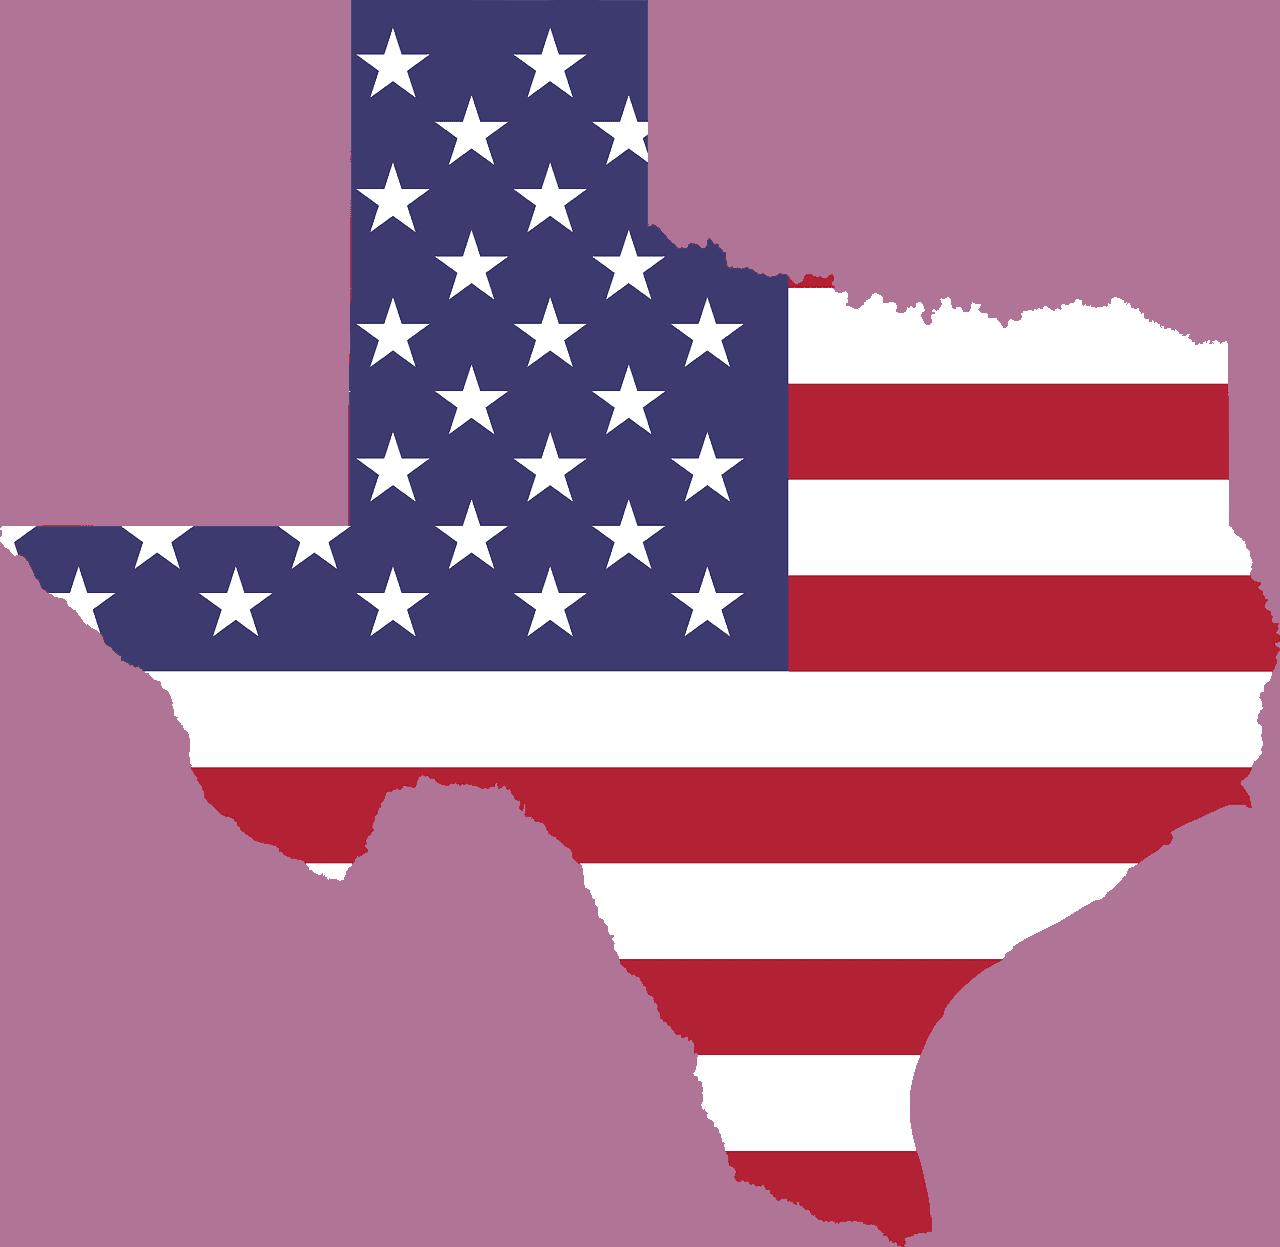 Is Hemp Legal in Texas? American flag cut out like Texas.